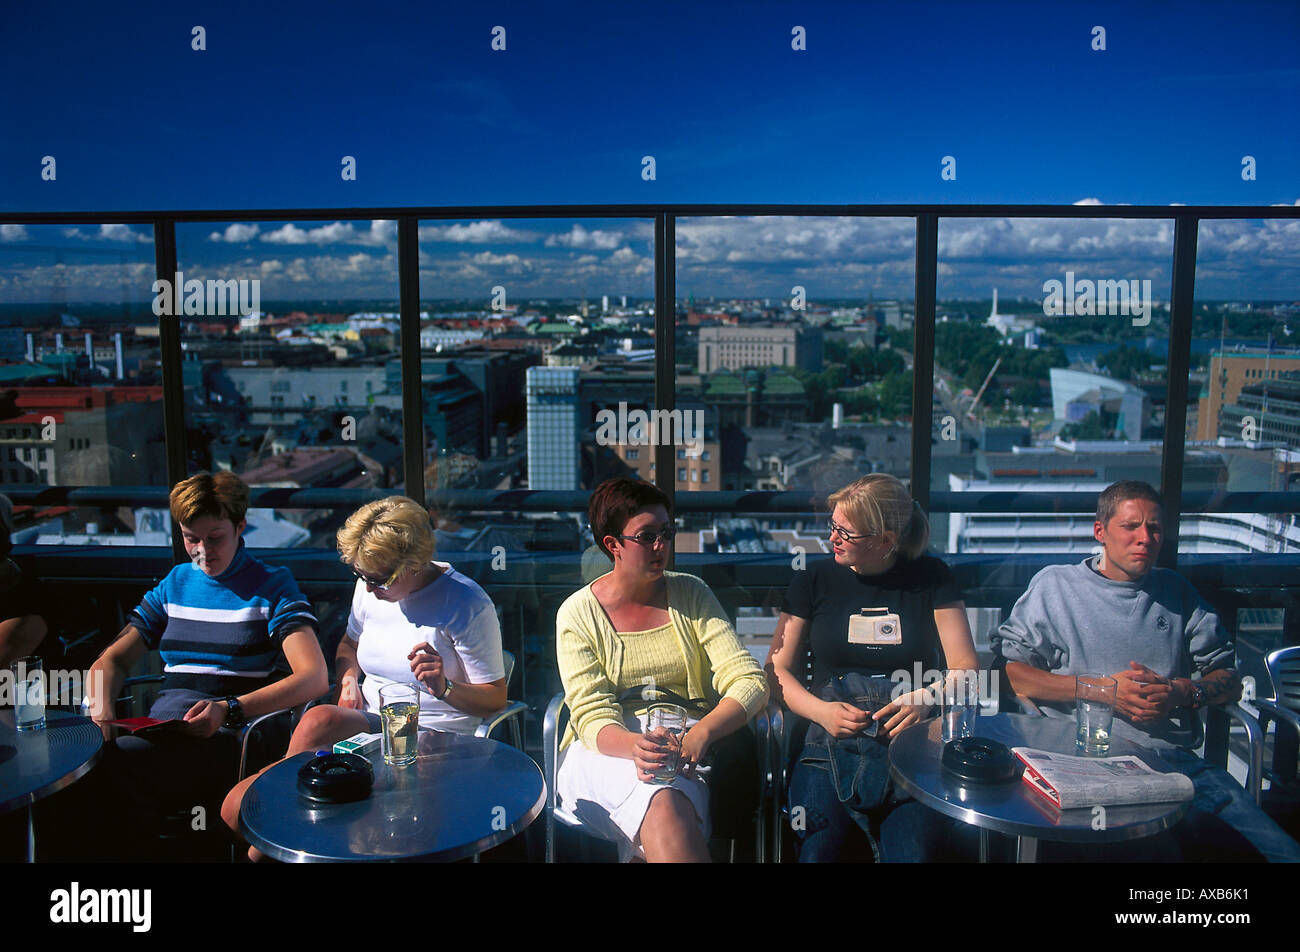 Tornin Ateljee sky bar, Helsinki Finland Stock Photo, Royalty Free Image: 9593776 - Alamy